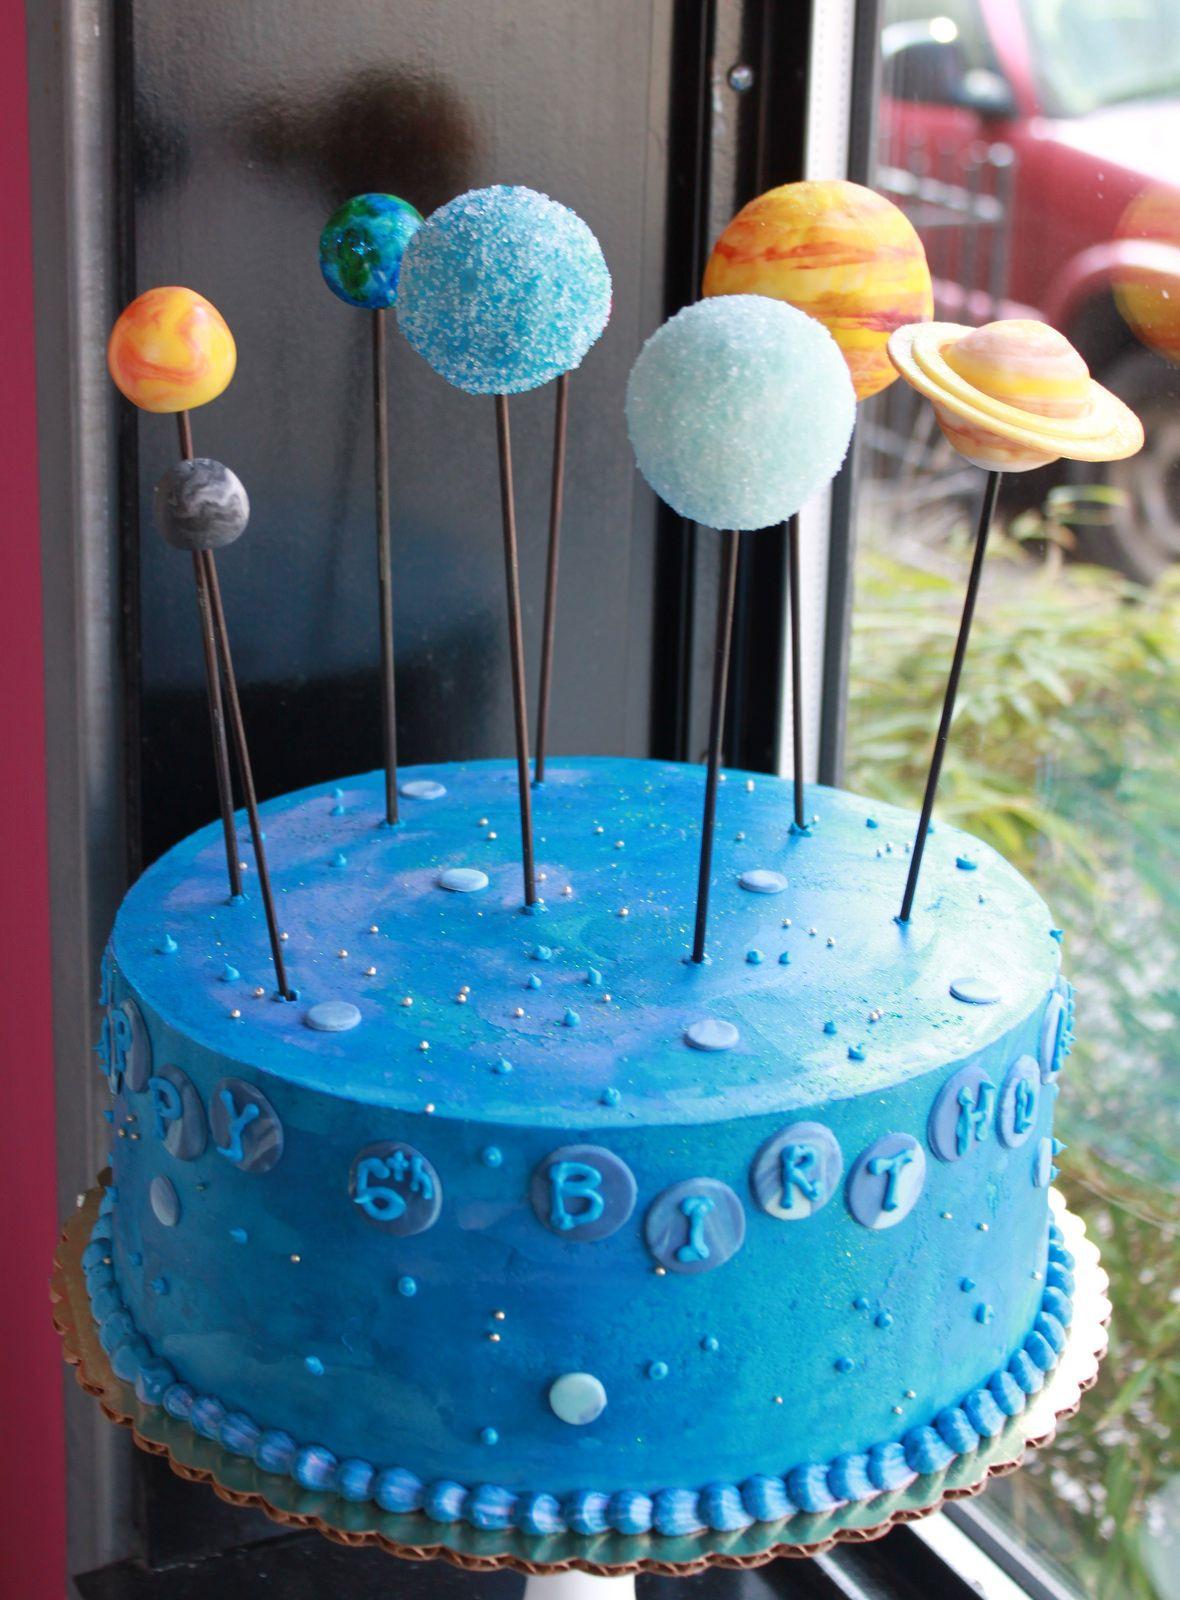 Space Cake Grandchild Pinterest Cake And Birthdays